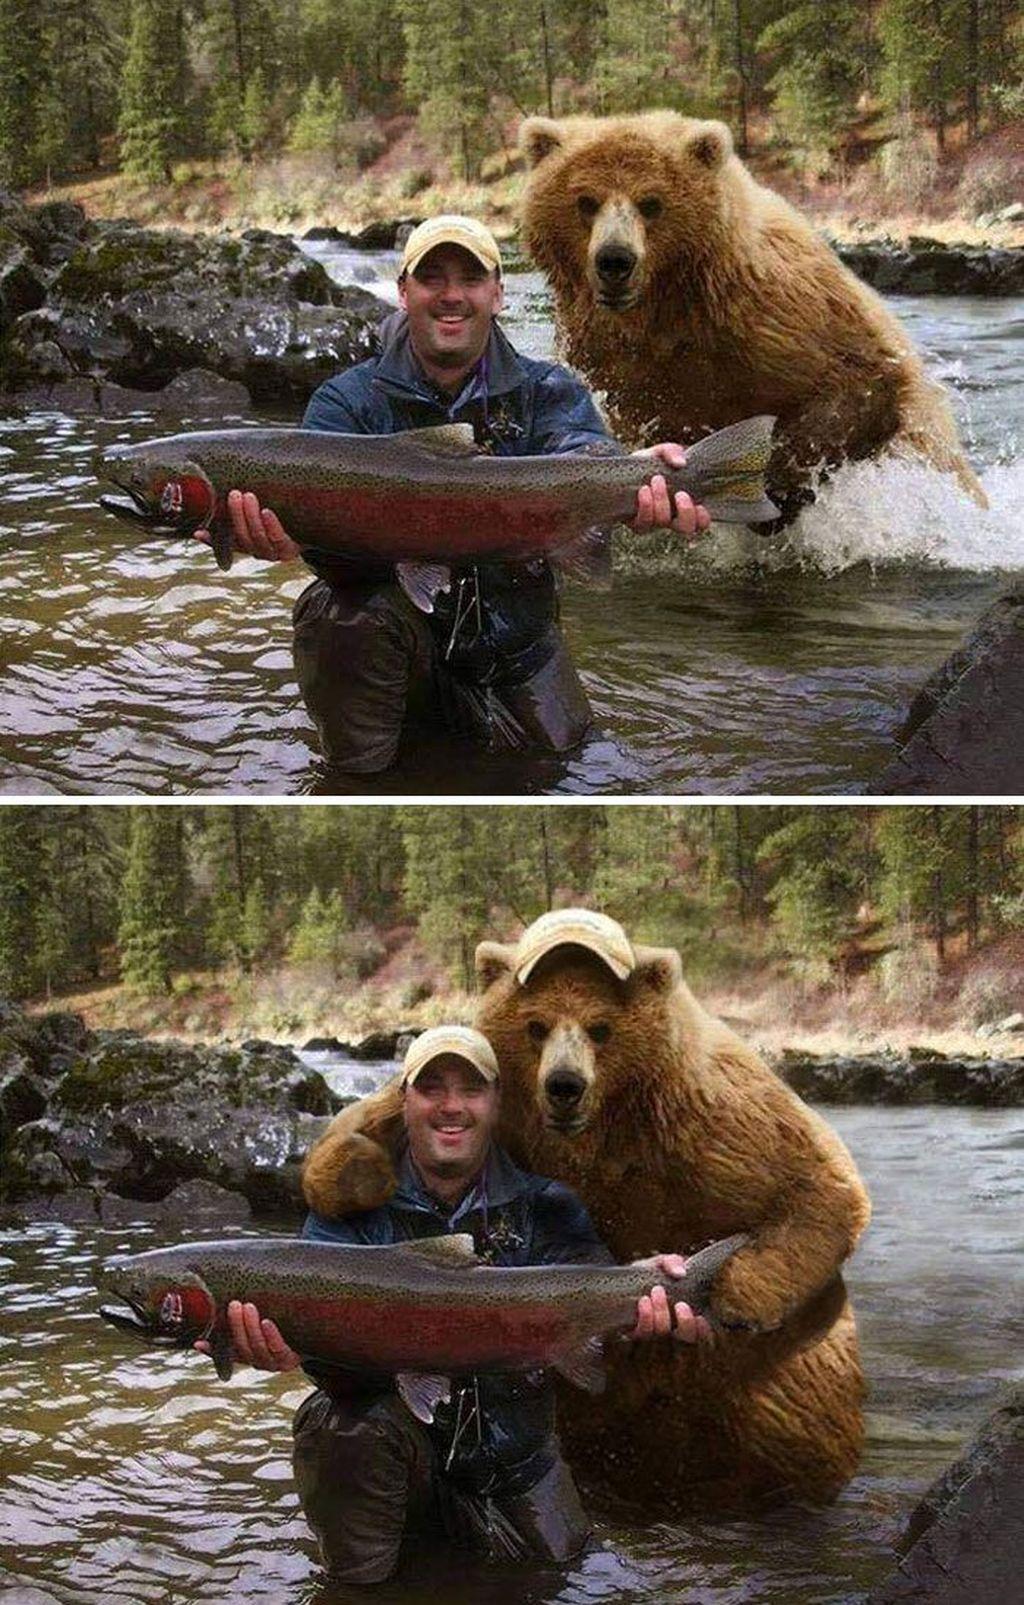 Pose hasil buruan bersama beruang.(Foto: Boredpanda)